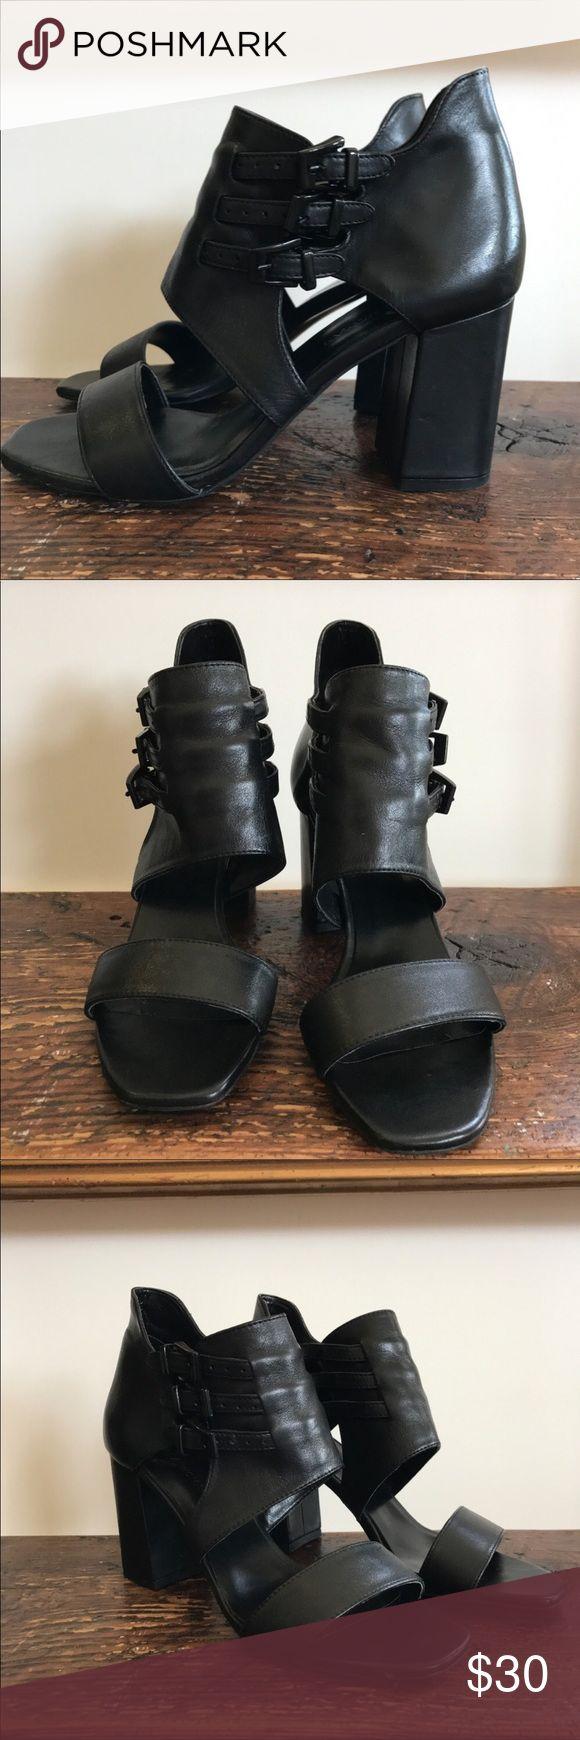 Black Zara Sandals By Zara, purchased at Zara Barcelona Store  Size EU 38, US 8, true to size  Worn once, like new Zara Shoes Sandals